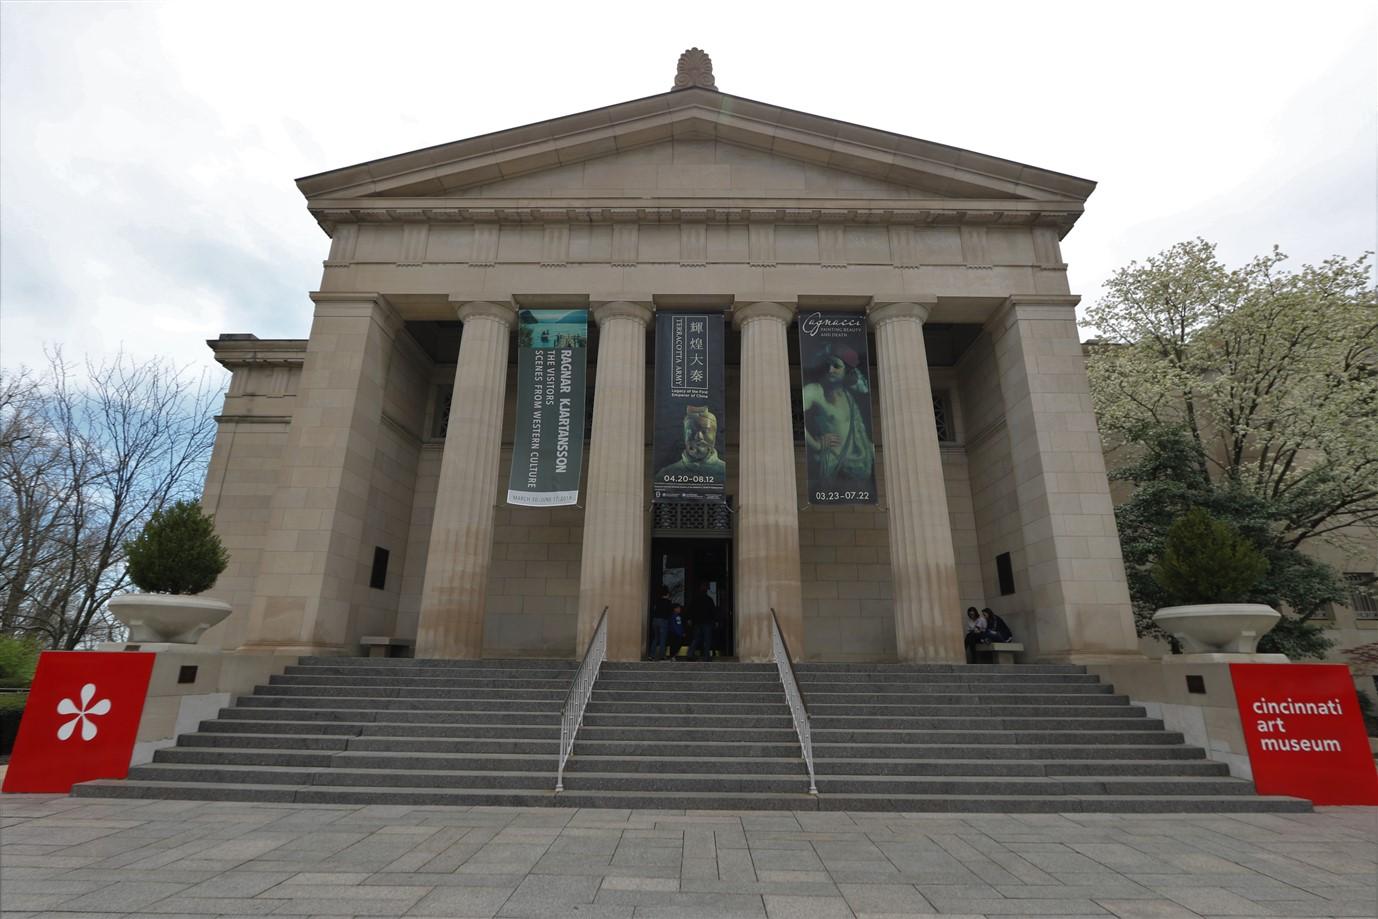 2018 04 21 1 Cincinnati Art Museum.jpg